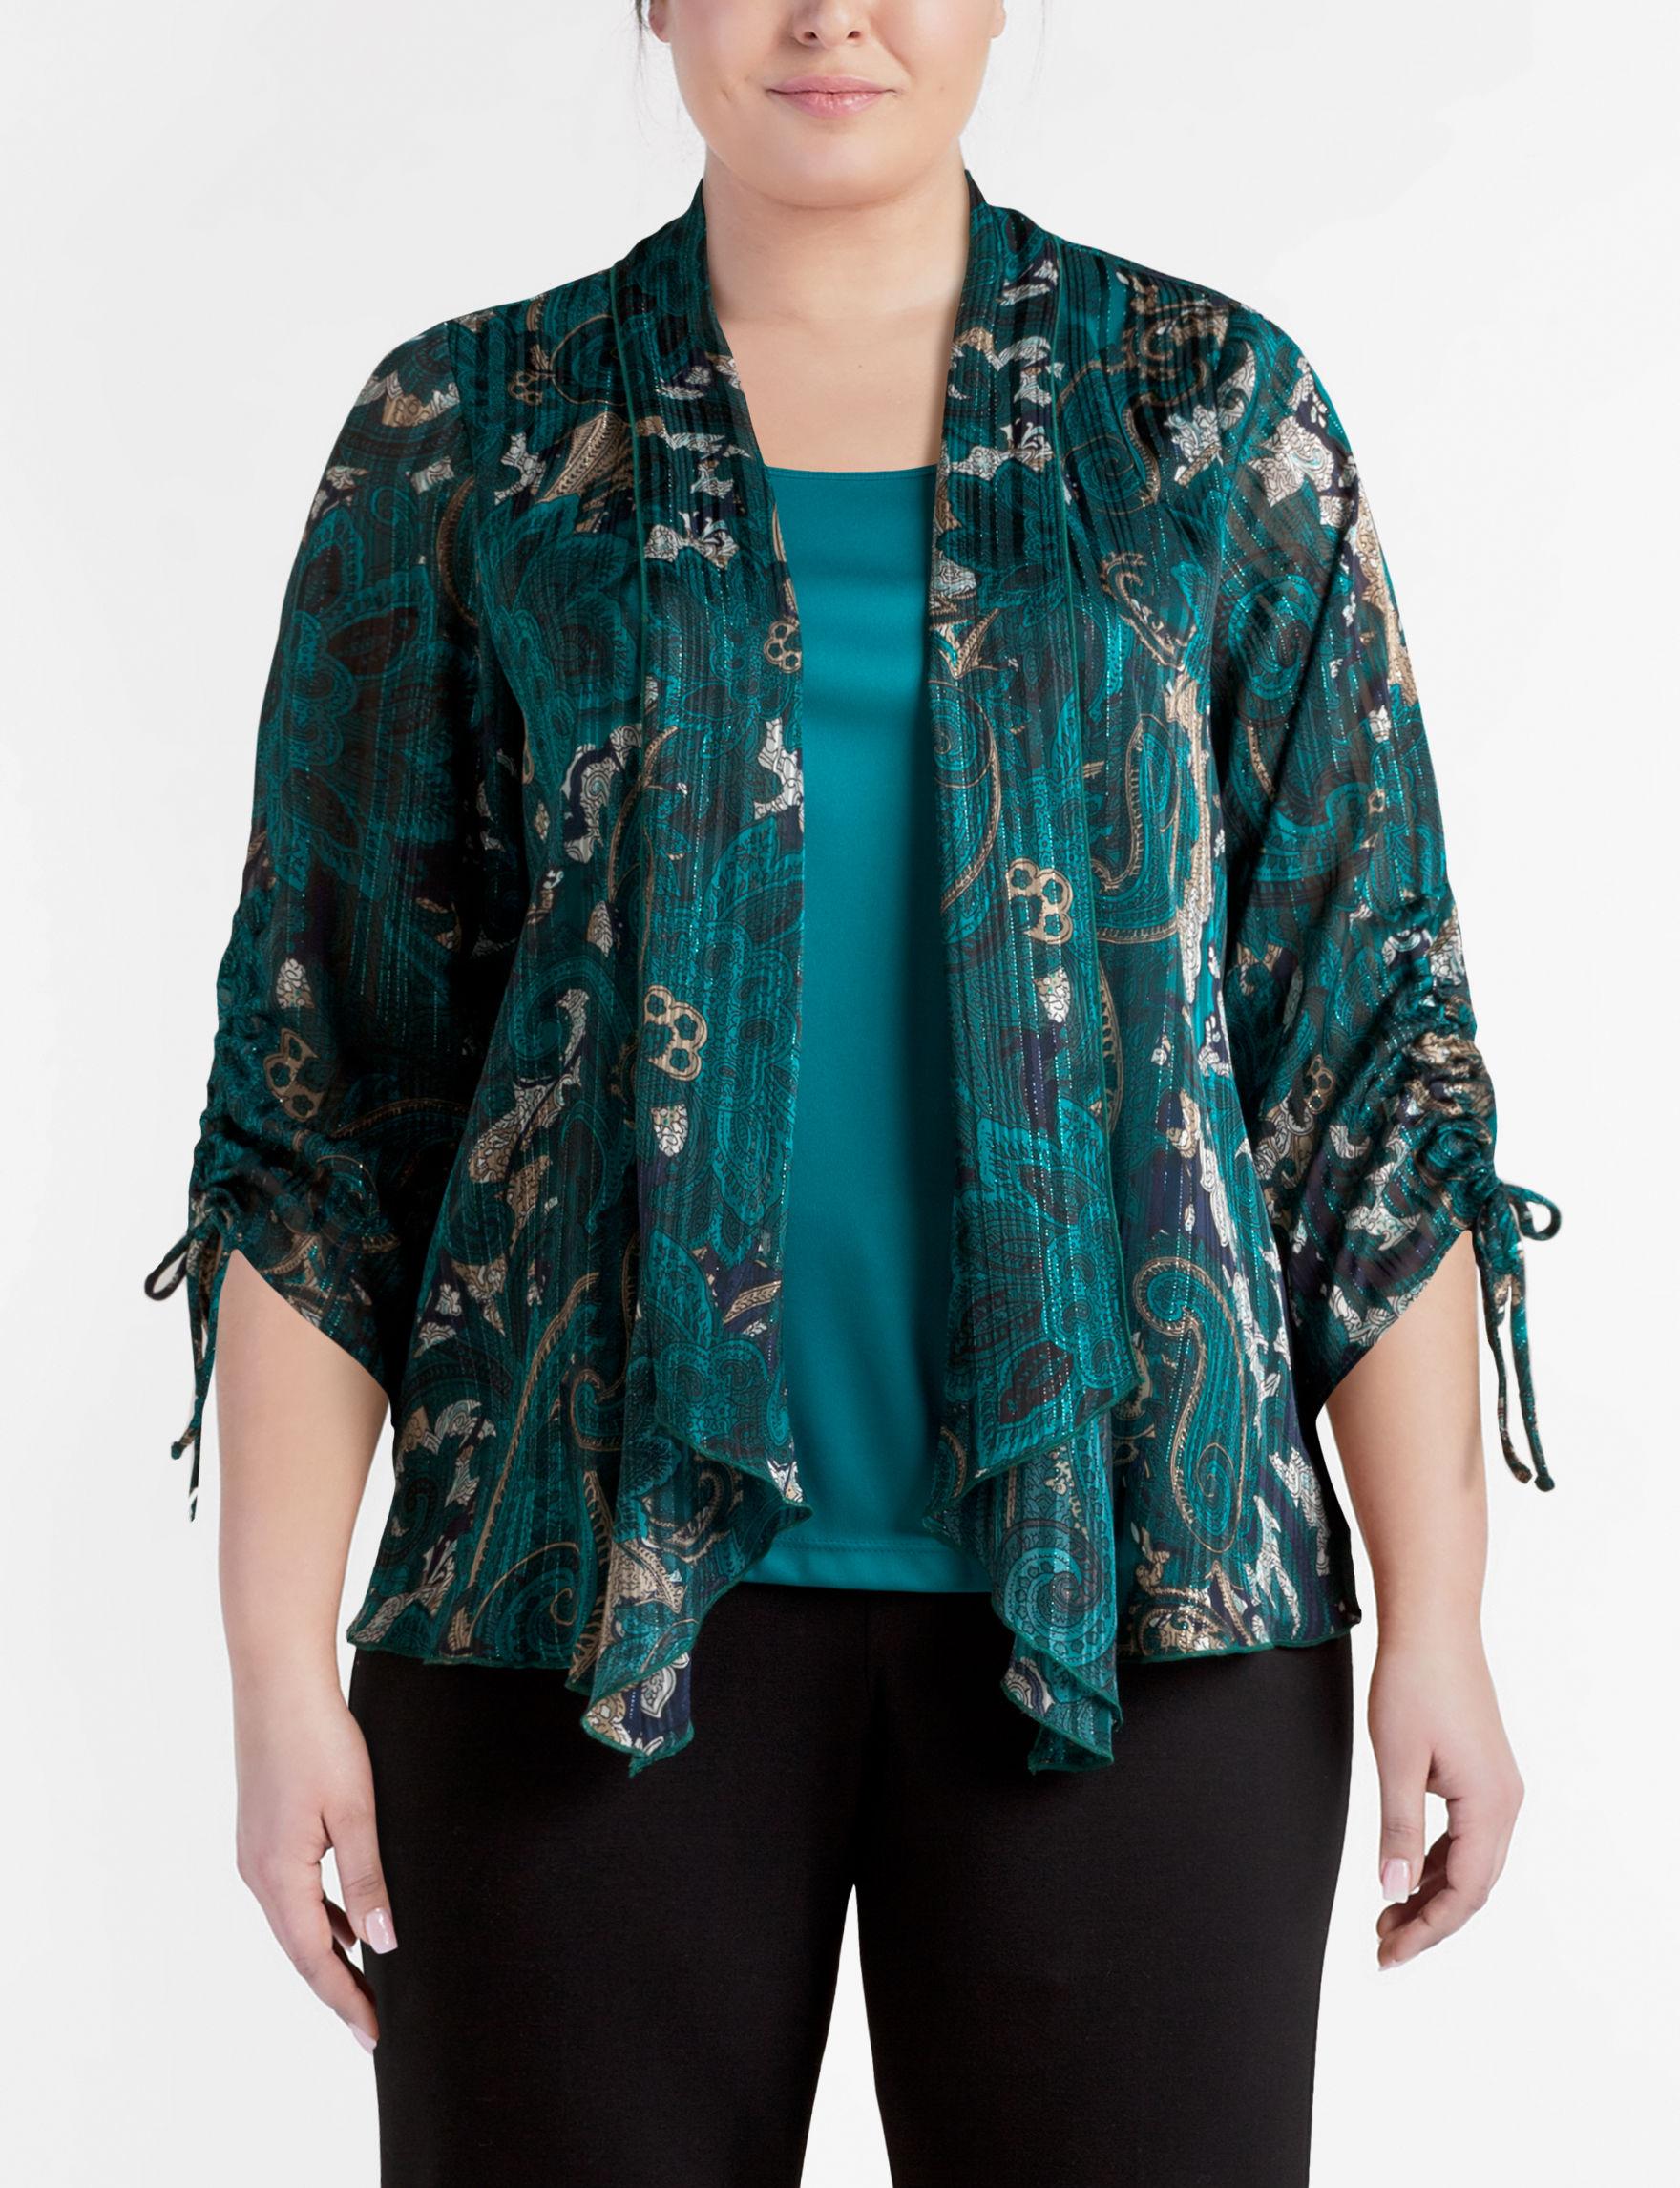 Turquoise Blouses Plus Size